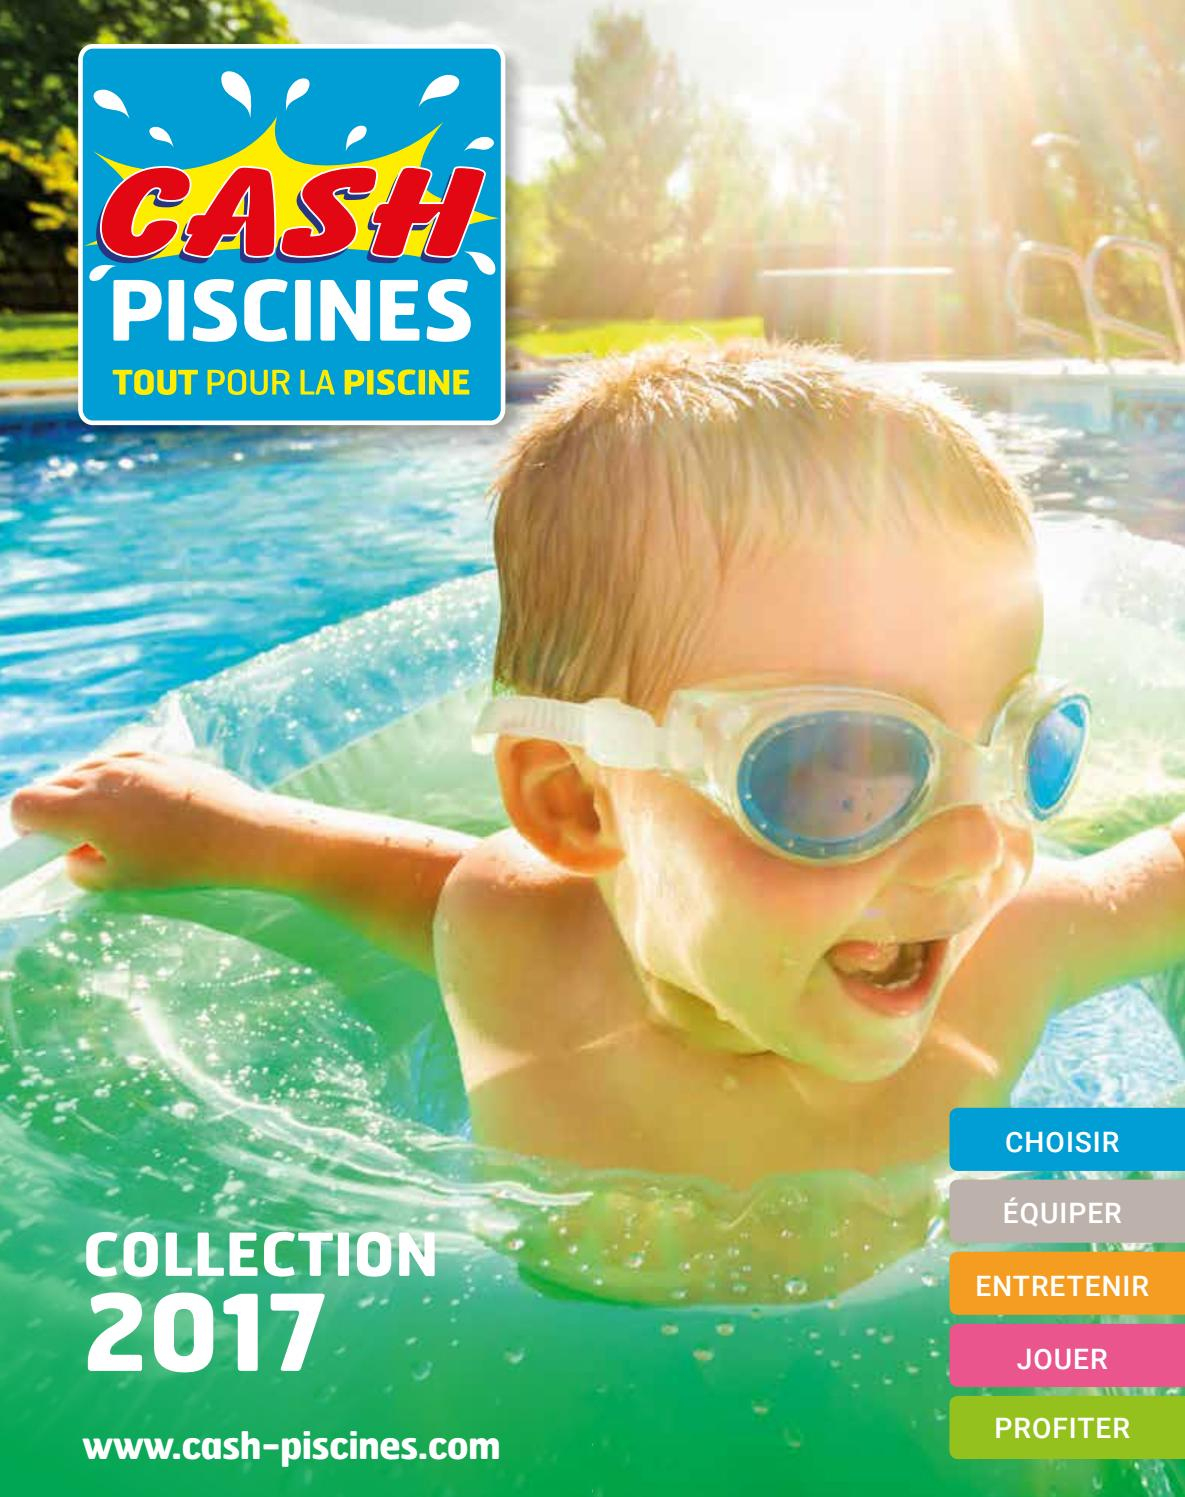 Catalogue Cash Piscine 2017 By Octave Octave - Issuu encequiconcerne Cash Piscine Bourgoin